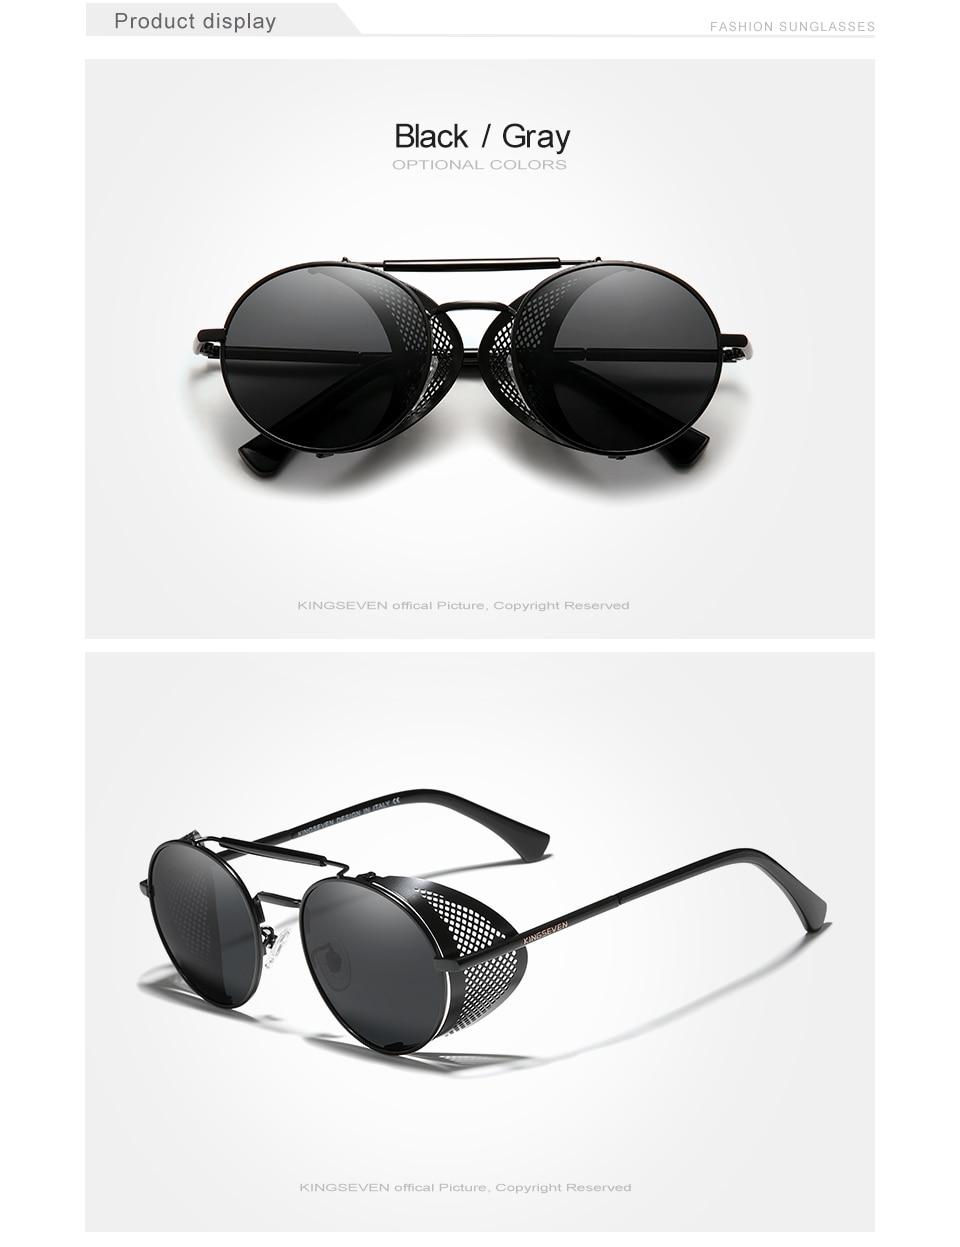 H5929582cb9994880a6bdbad5e087b41dW Genuine GIFTINGER Retro Round Steampunk Sunglasses Men Retro Women Sun Glasses Shades Vintage Travel Eyewear Gafas De Sol 7550